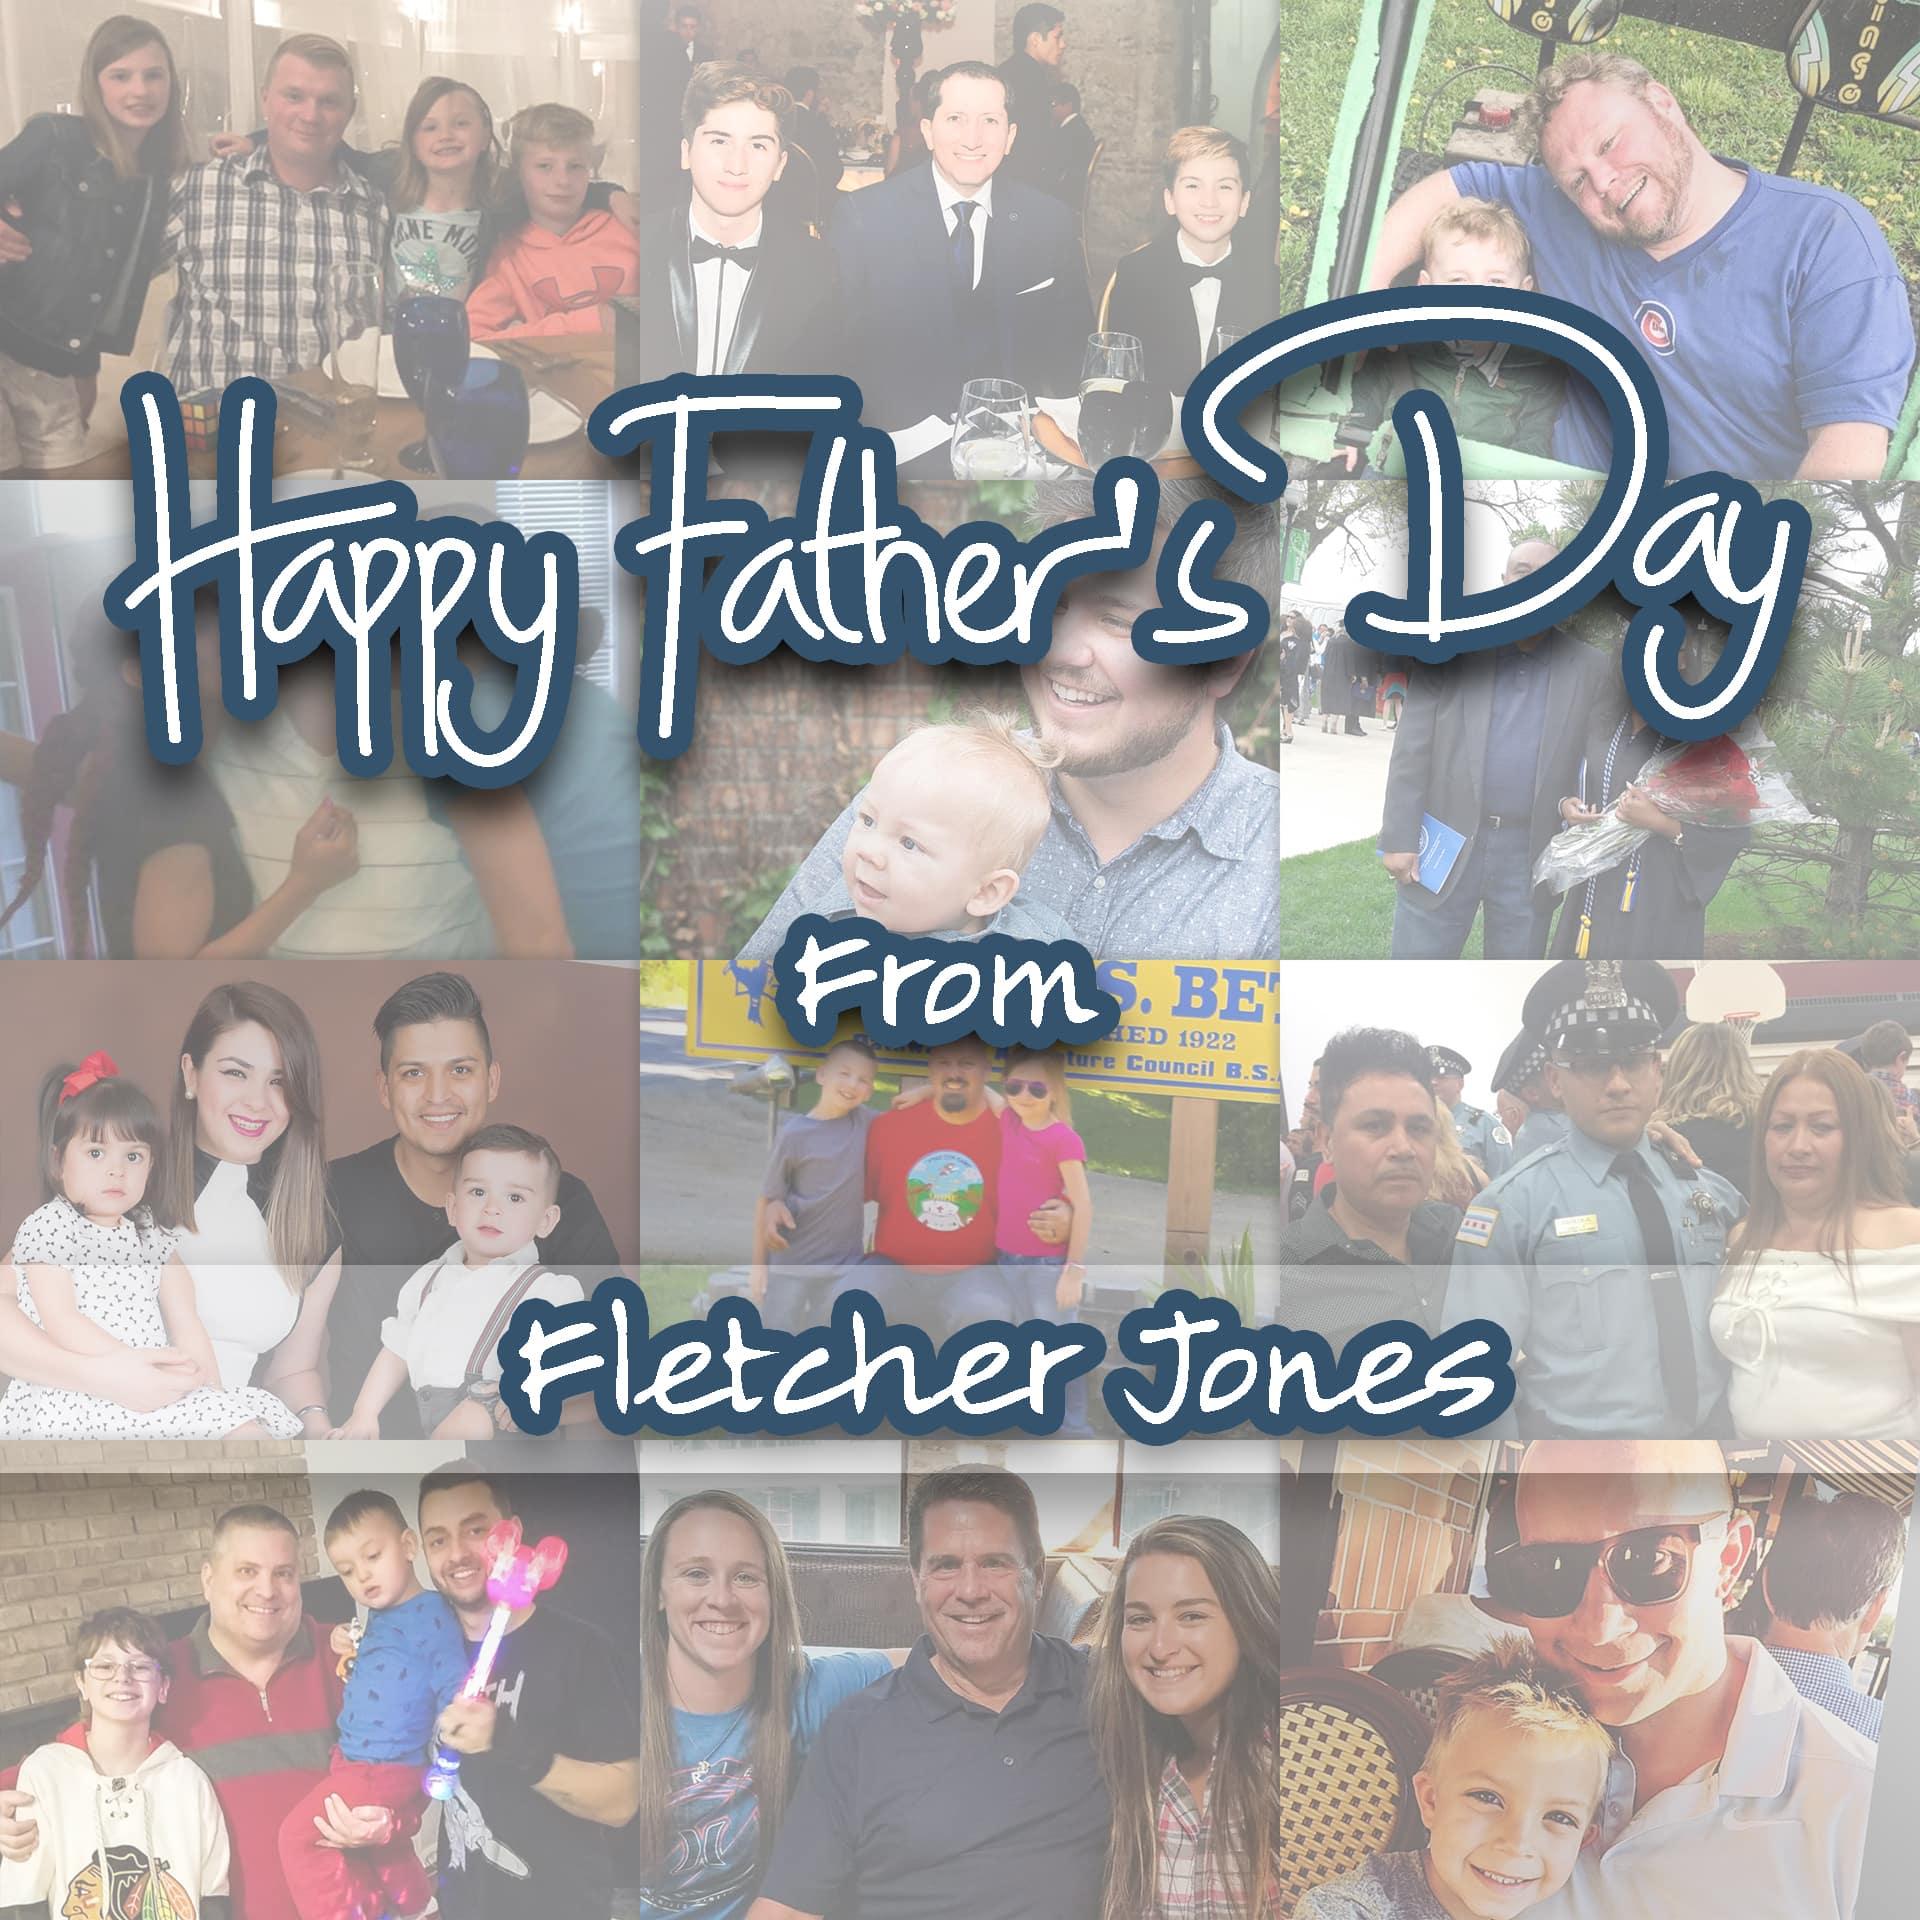 Happy Fathers Day From The Fletcher Jones Family MercedesBenz - Fletcher jones audi chicago